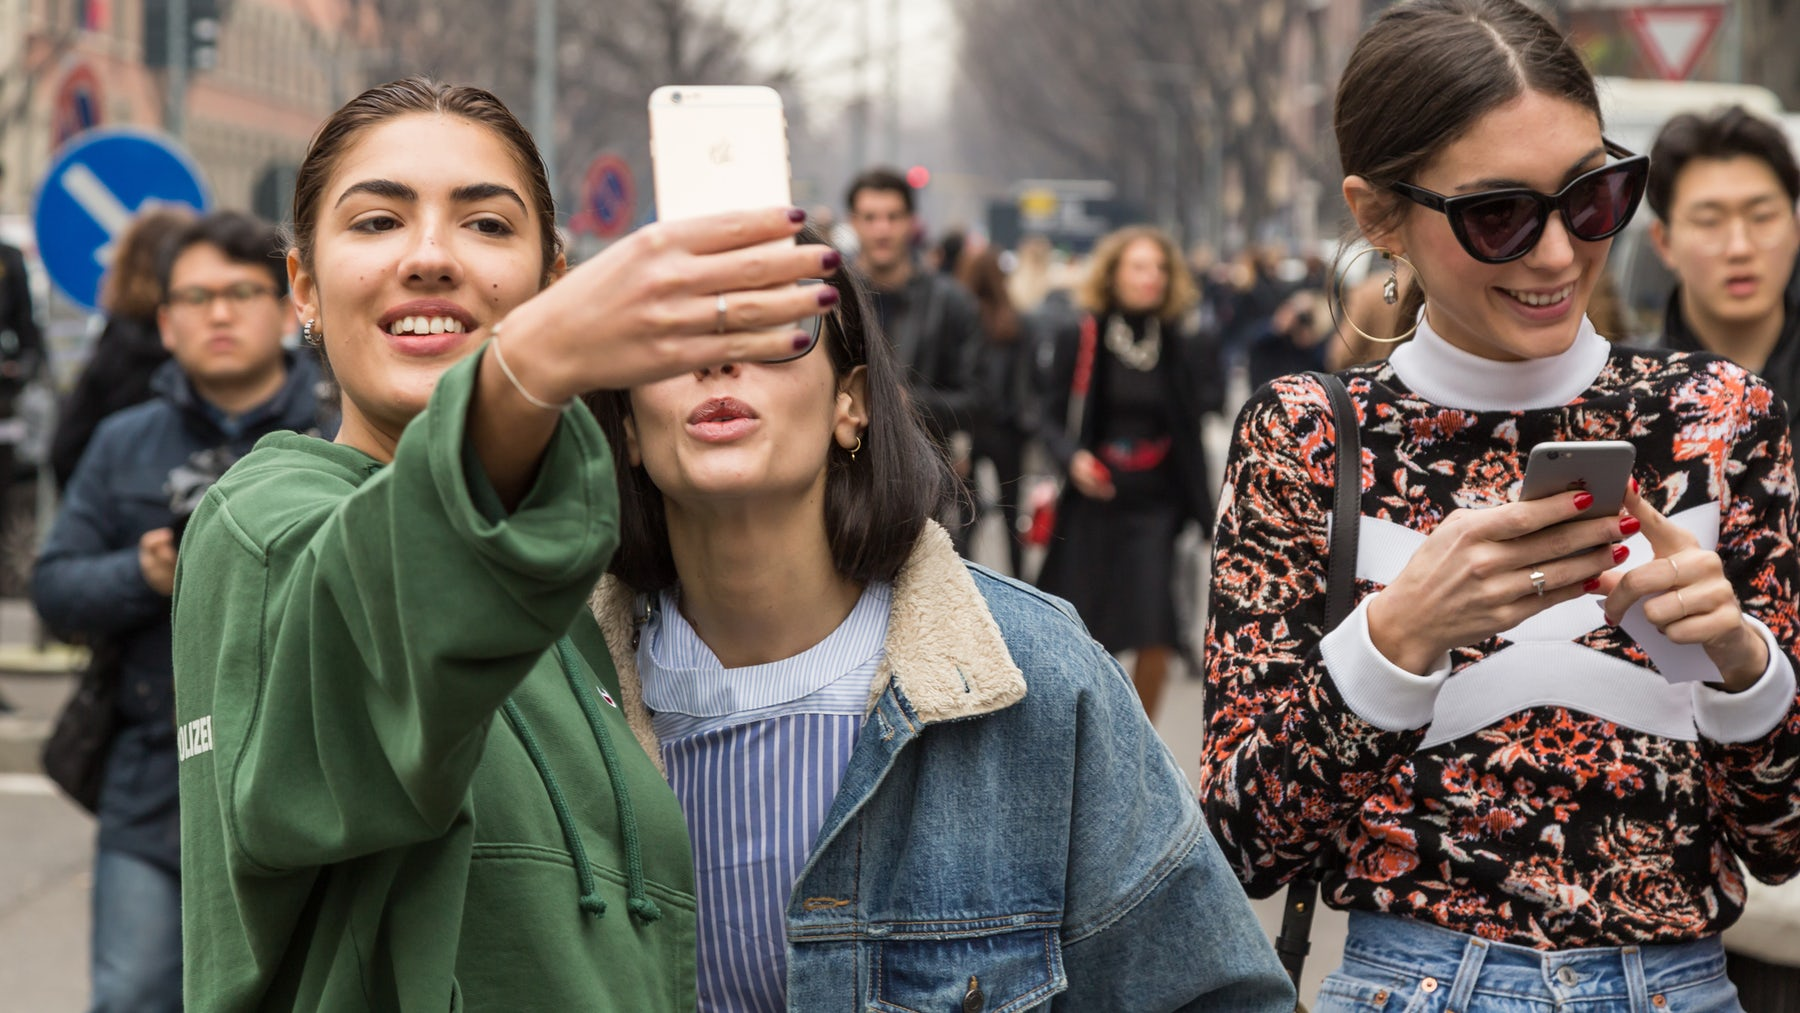 People taking selfies in Milan | Source: Shutterstock